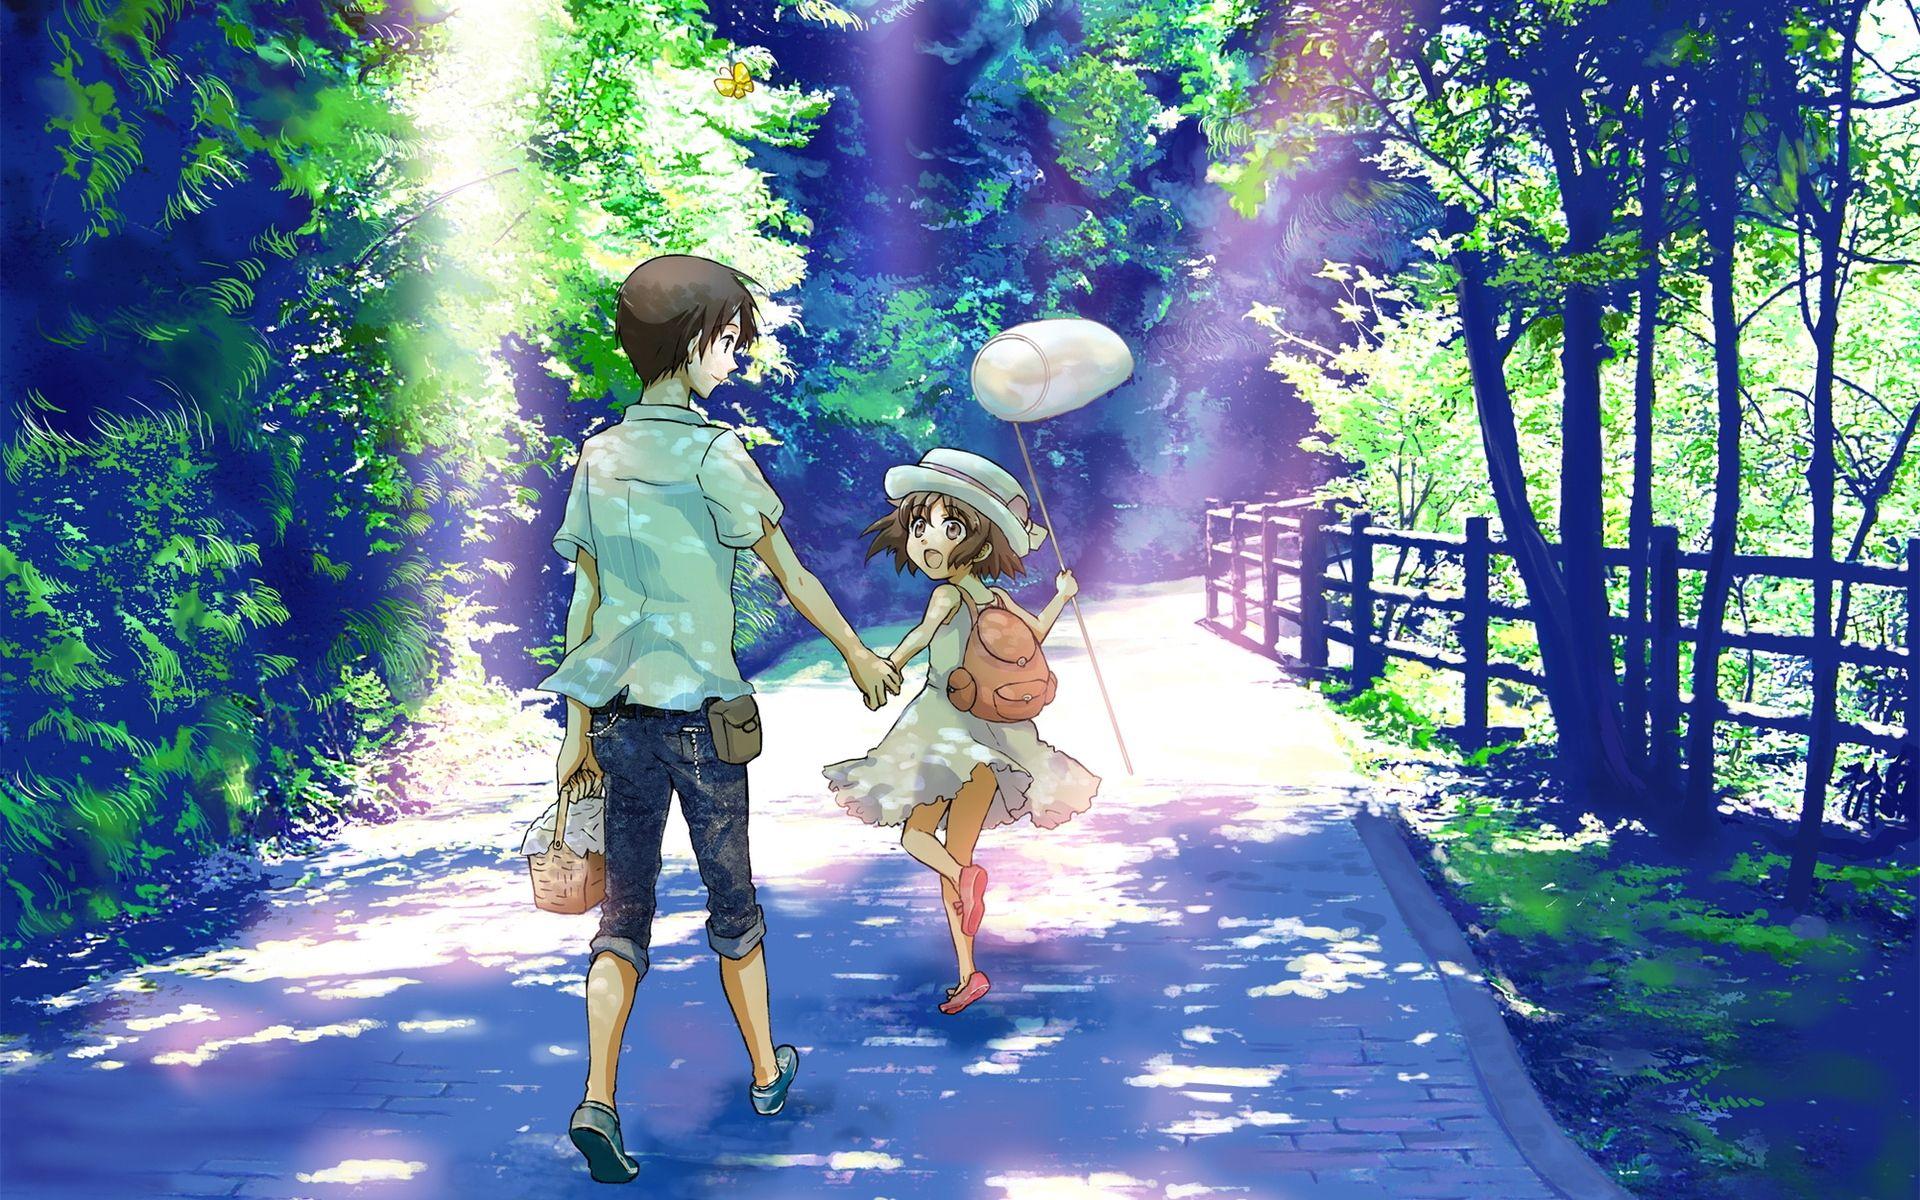 Summer Anime Anime Scenery Anime Summer Anime Wallpaper Download Anime summer wallpaper hd